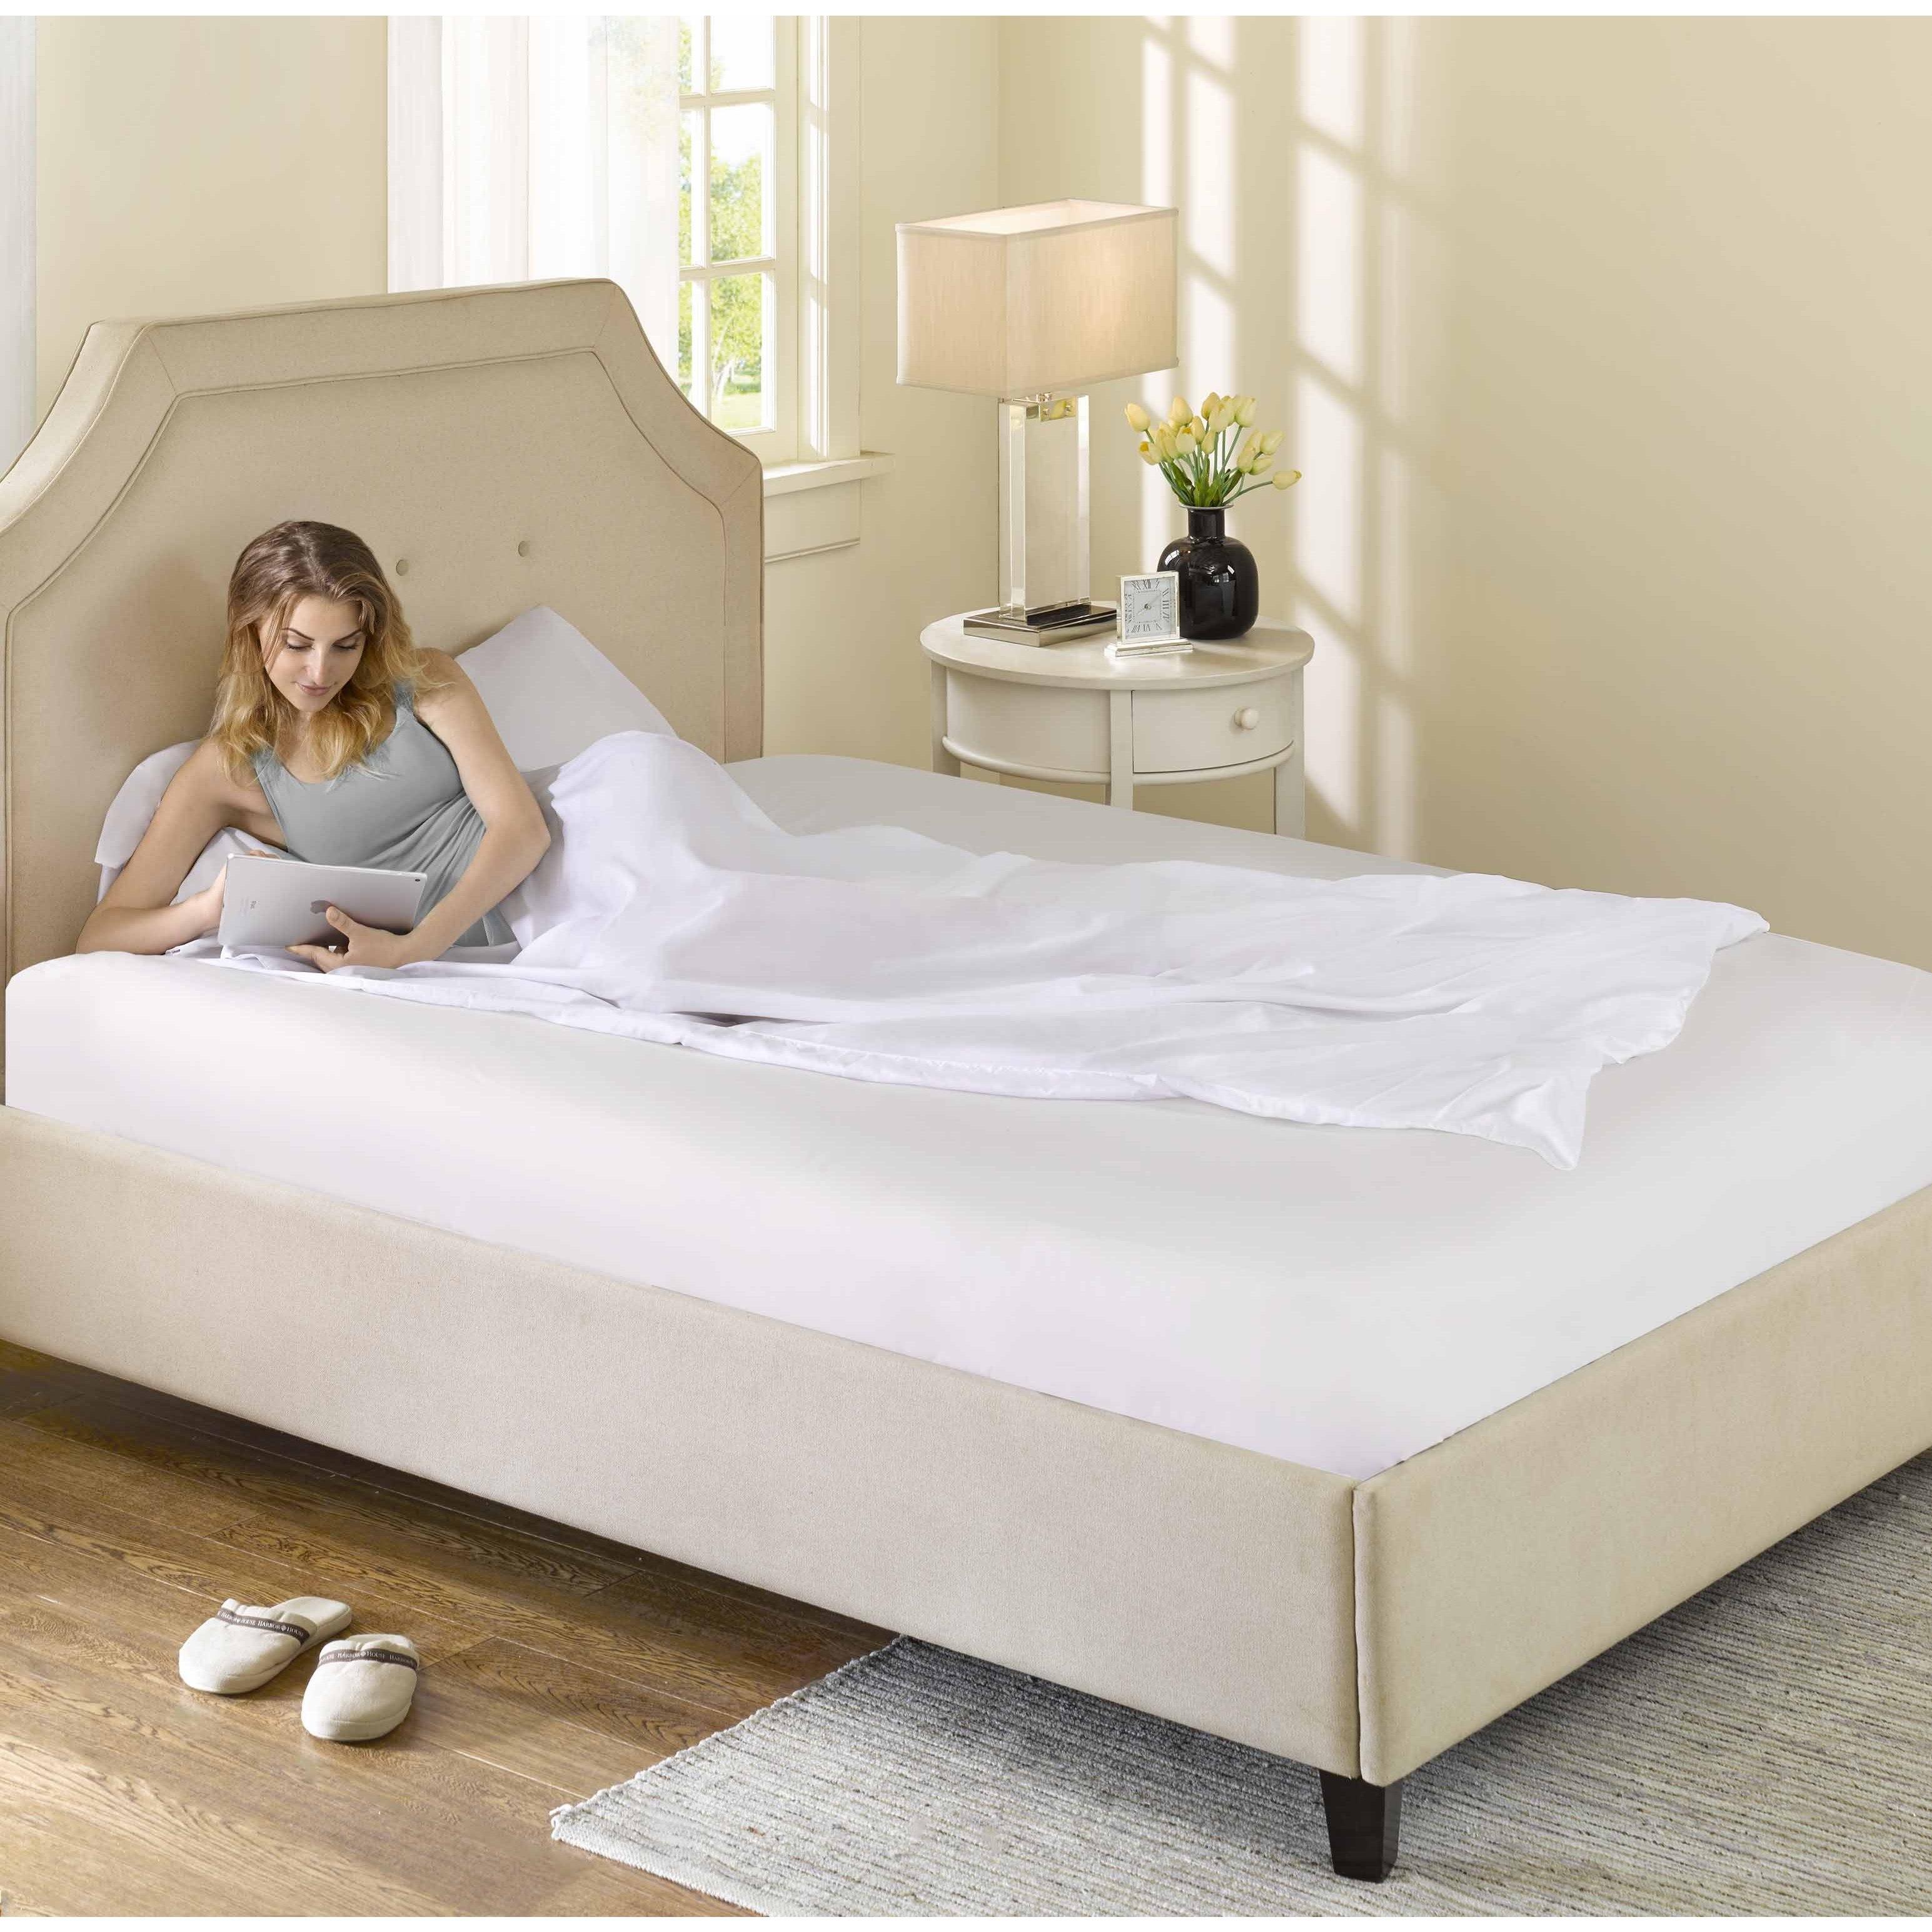 Bed Guardian by Sleep Philosophy Sleep Sack Treated with ...